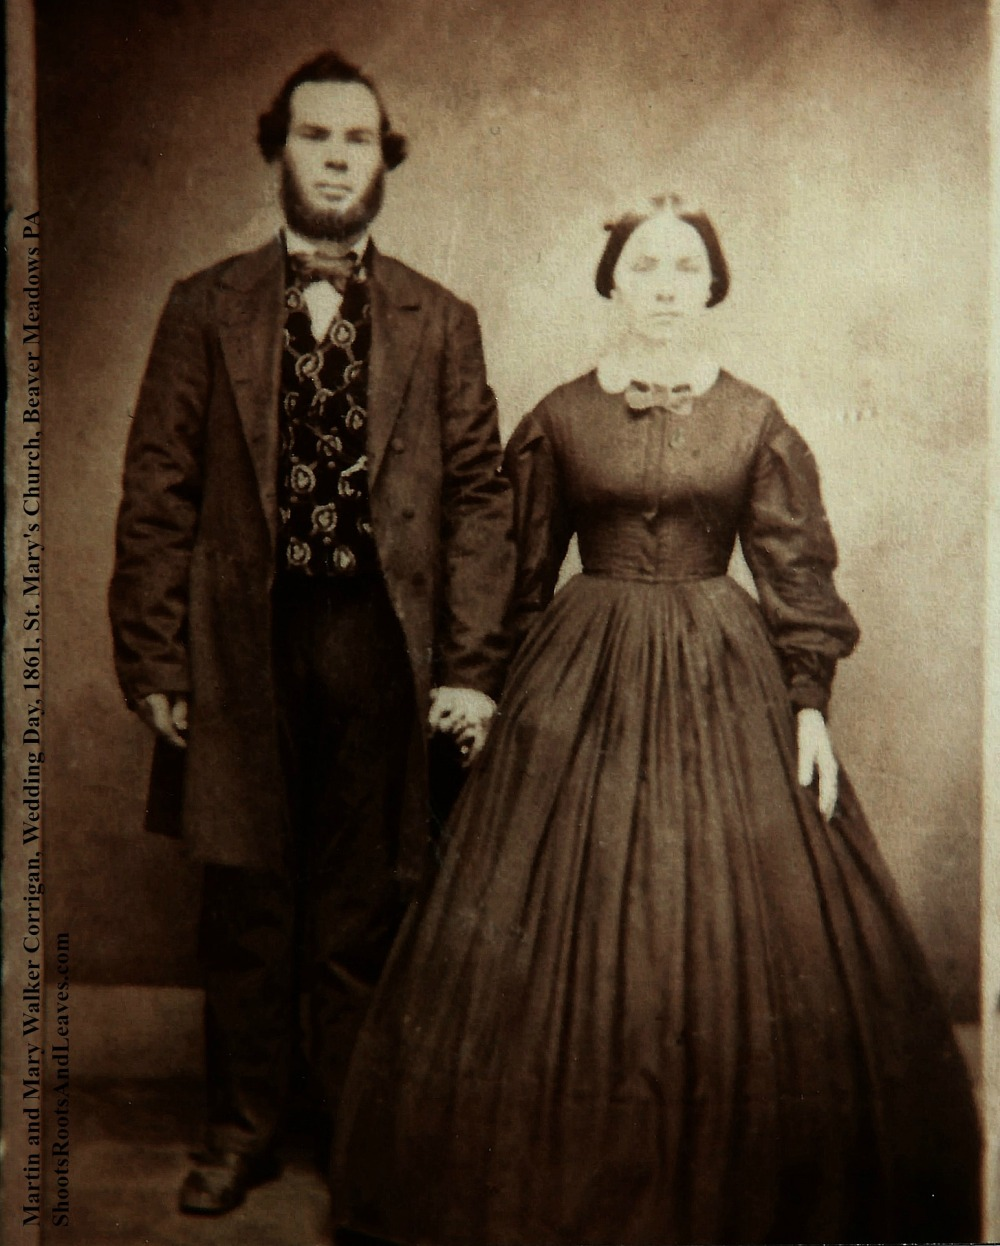 Photograph.CorriganMartinMary.Wedding.1860.EH2